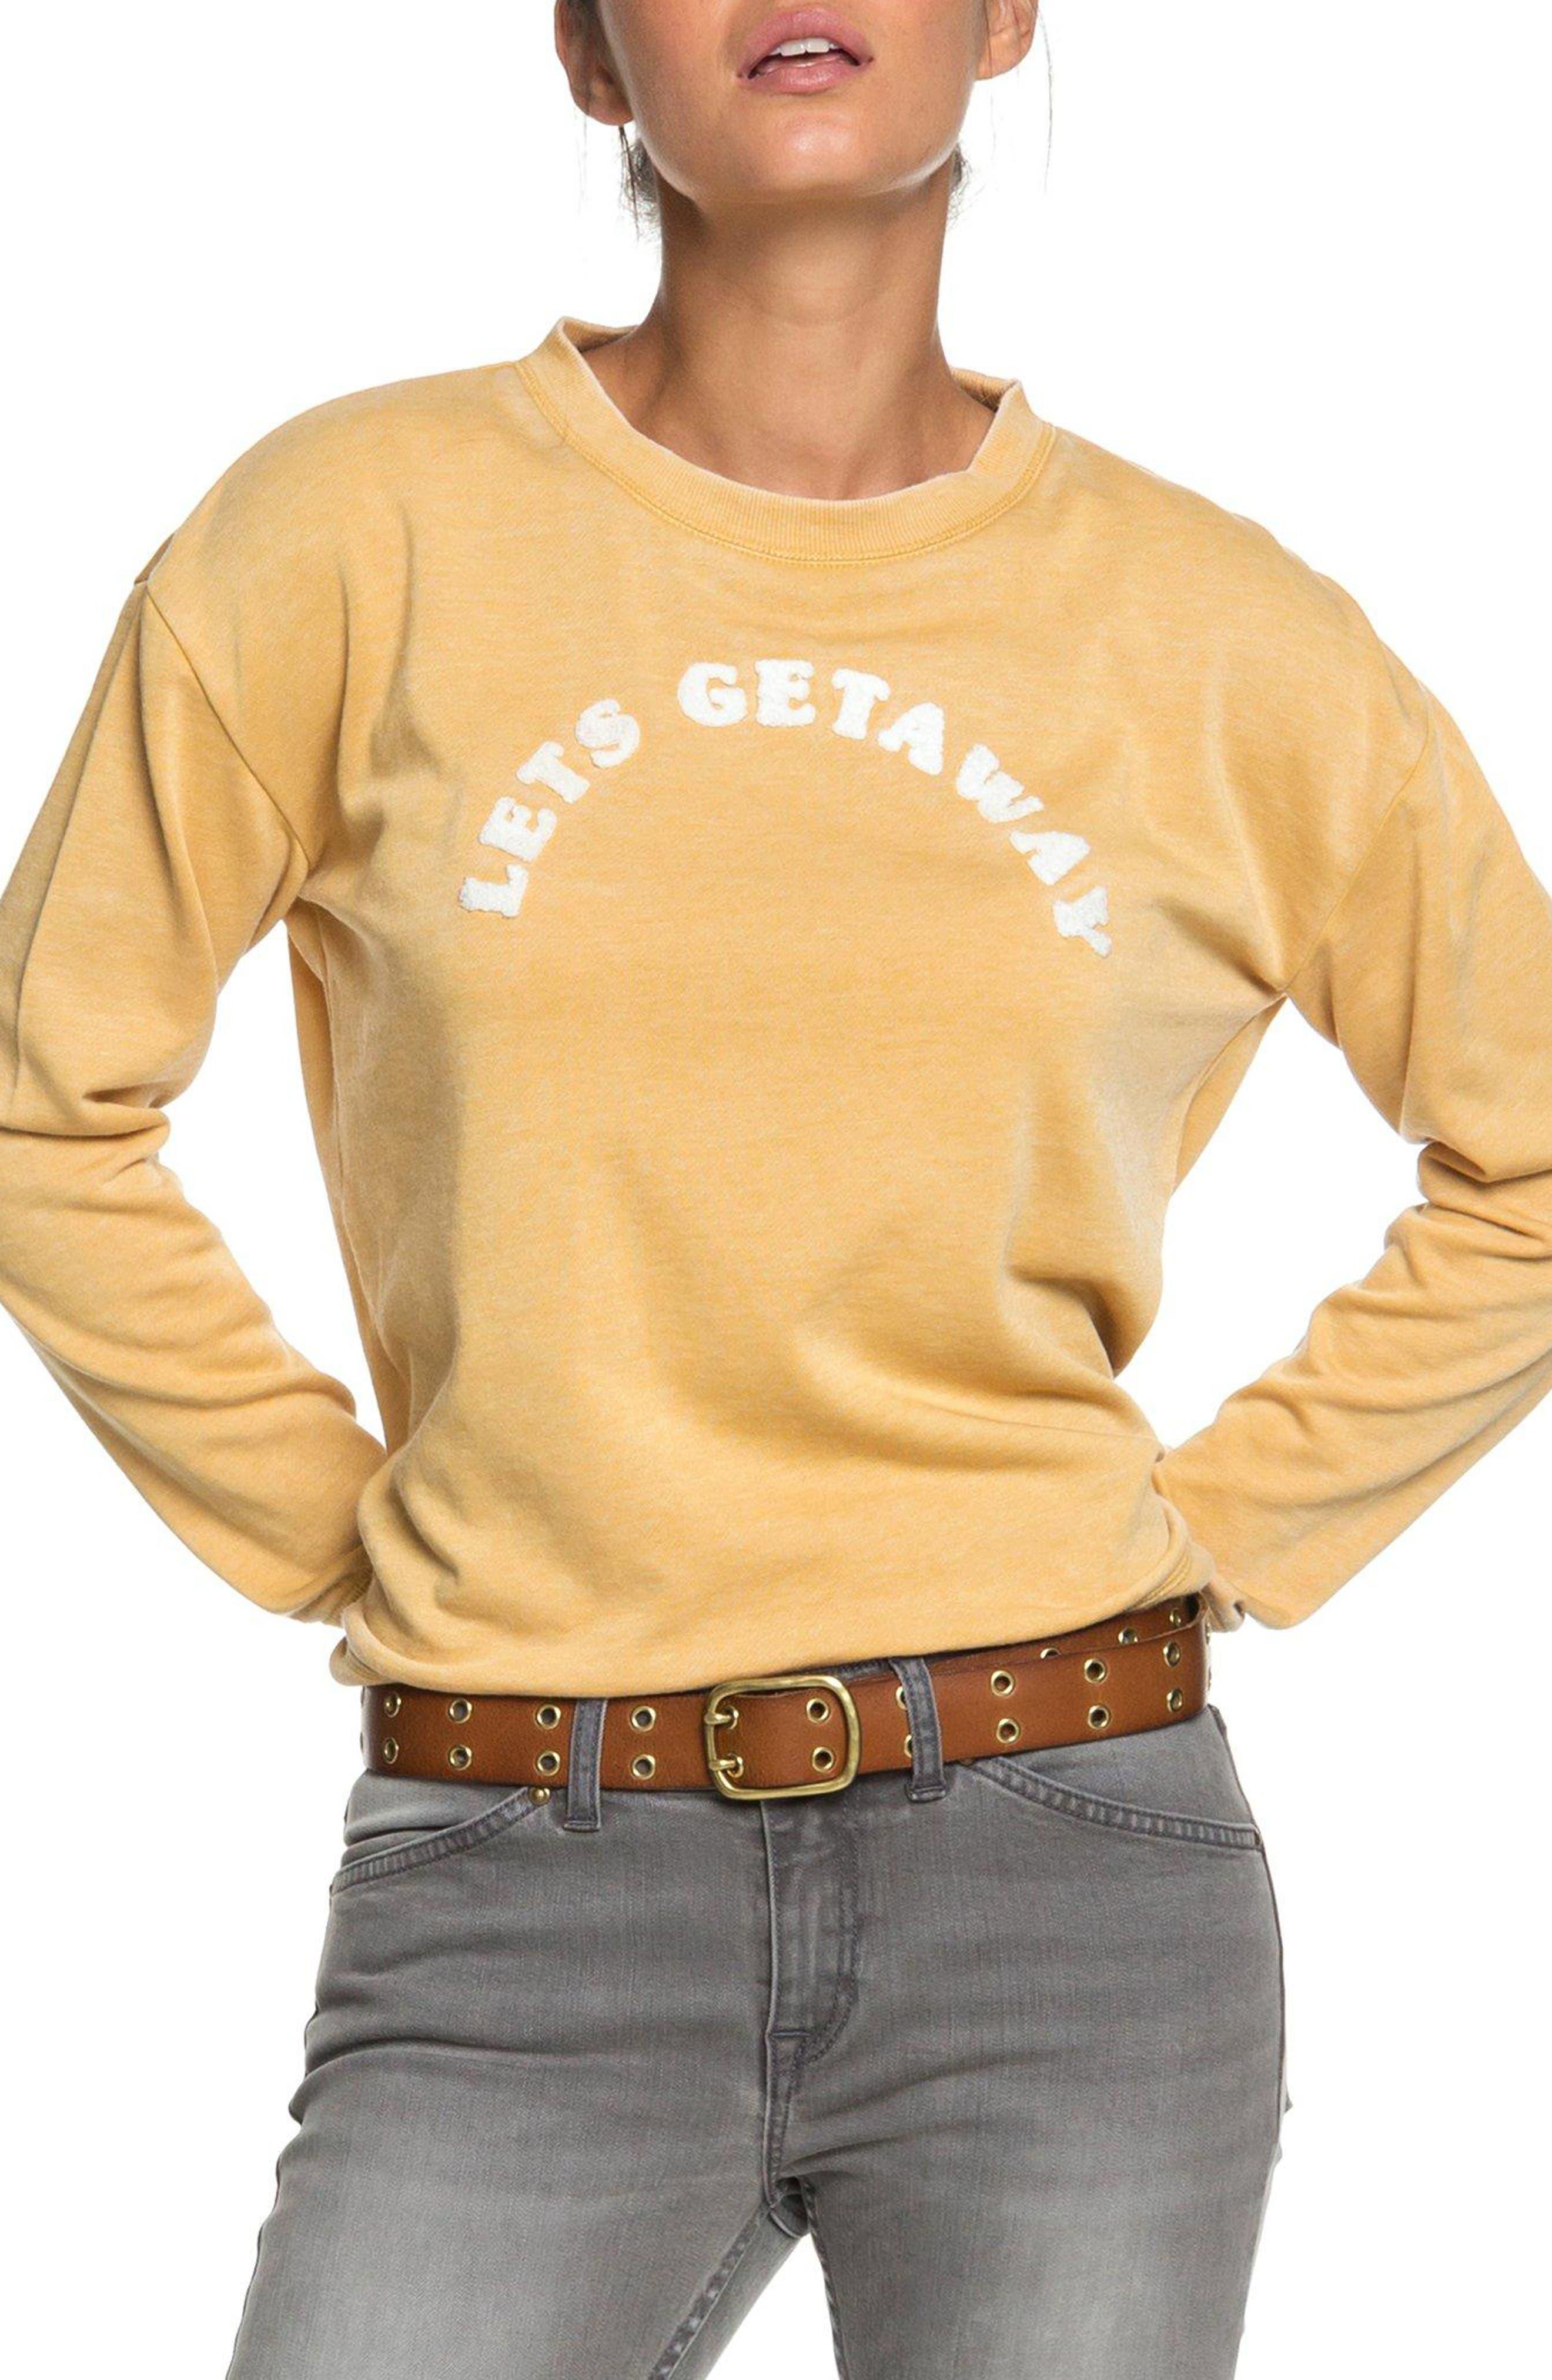 All At Sea Sweatshirt,                             Alternate thumbnail 2, color,                             700